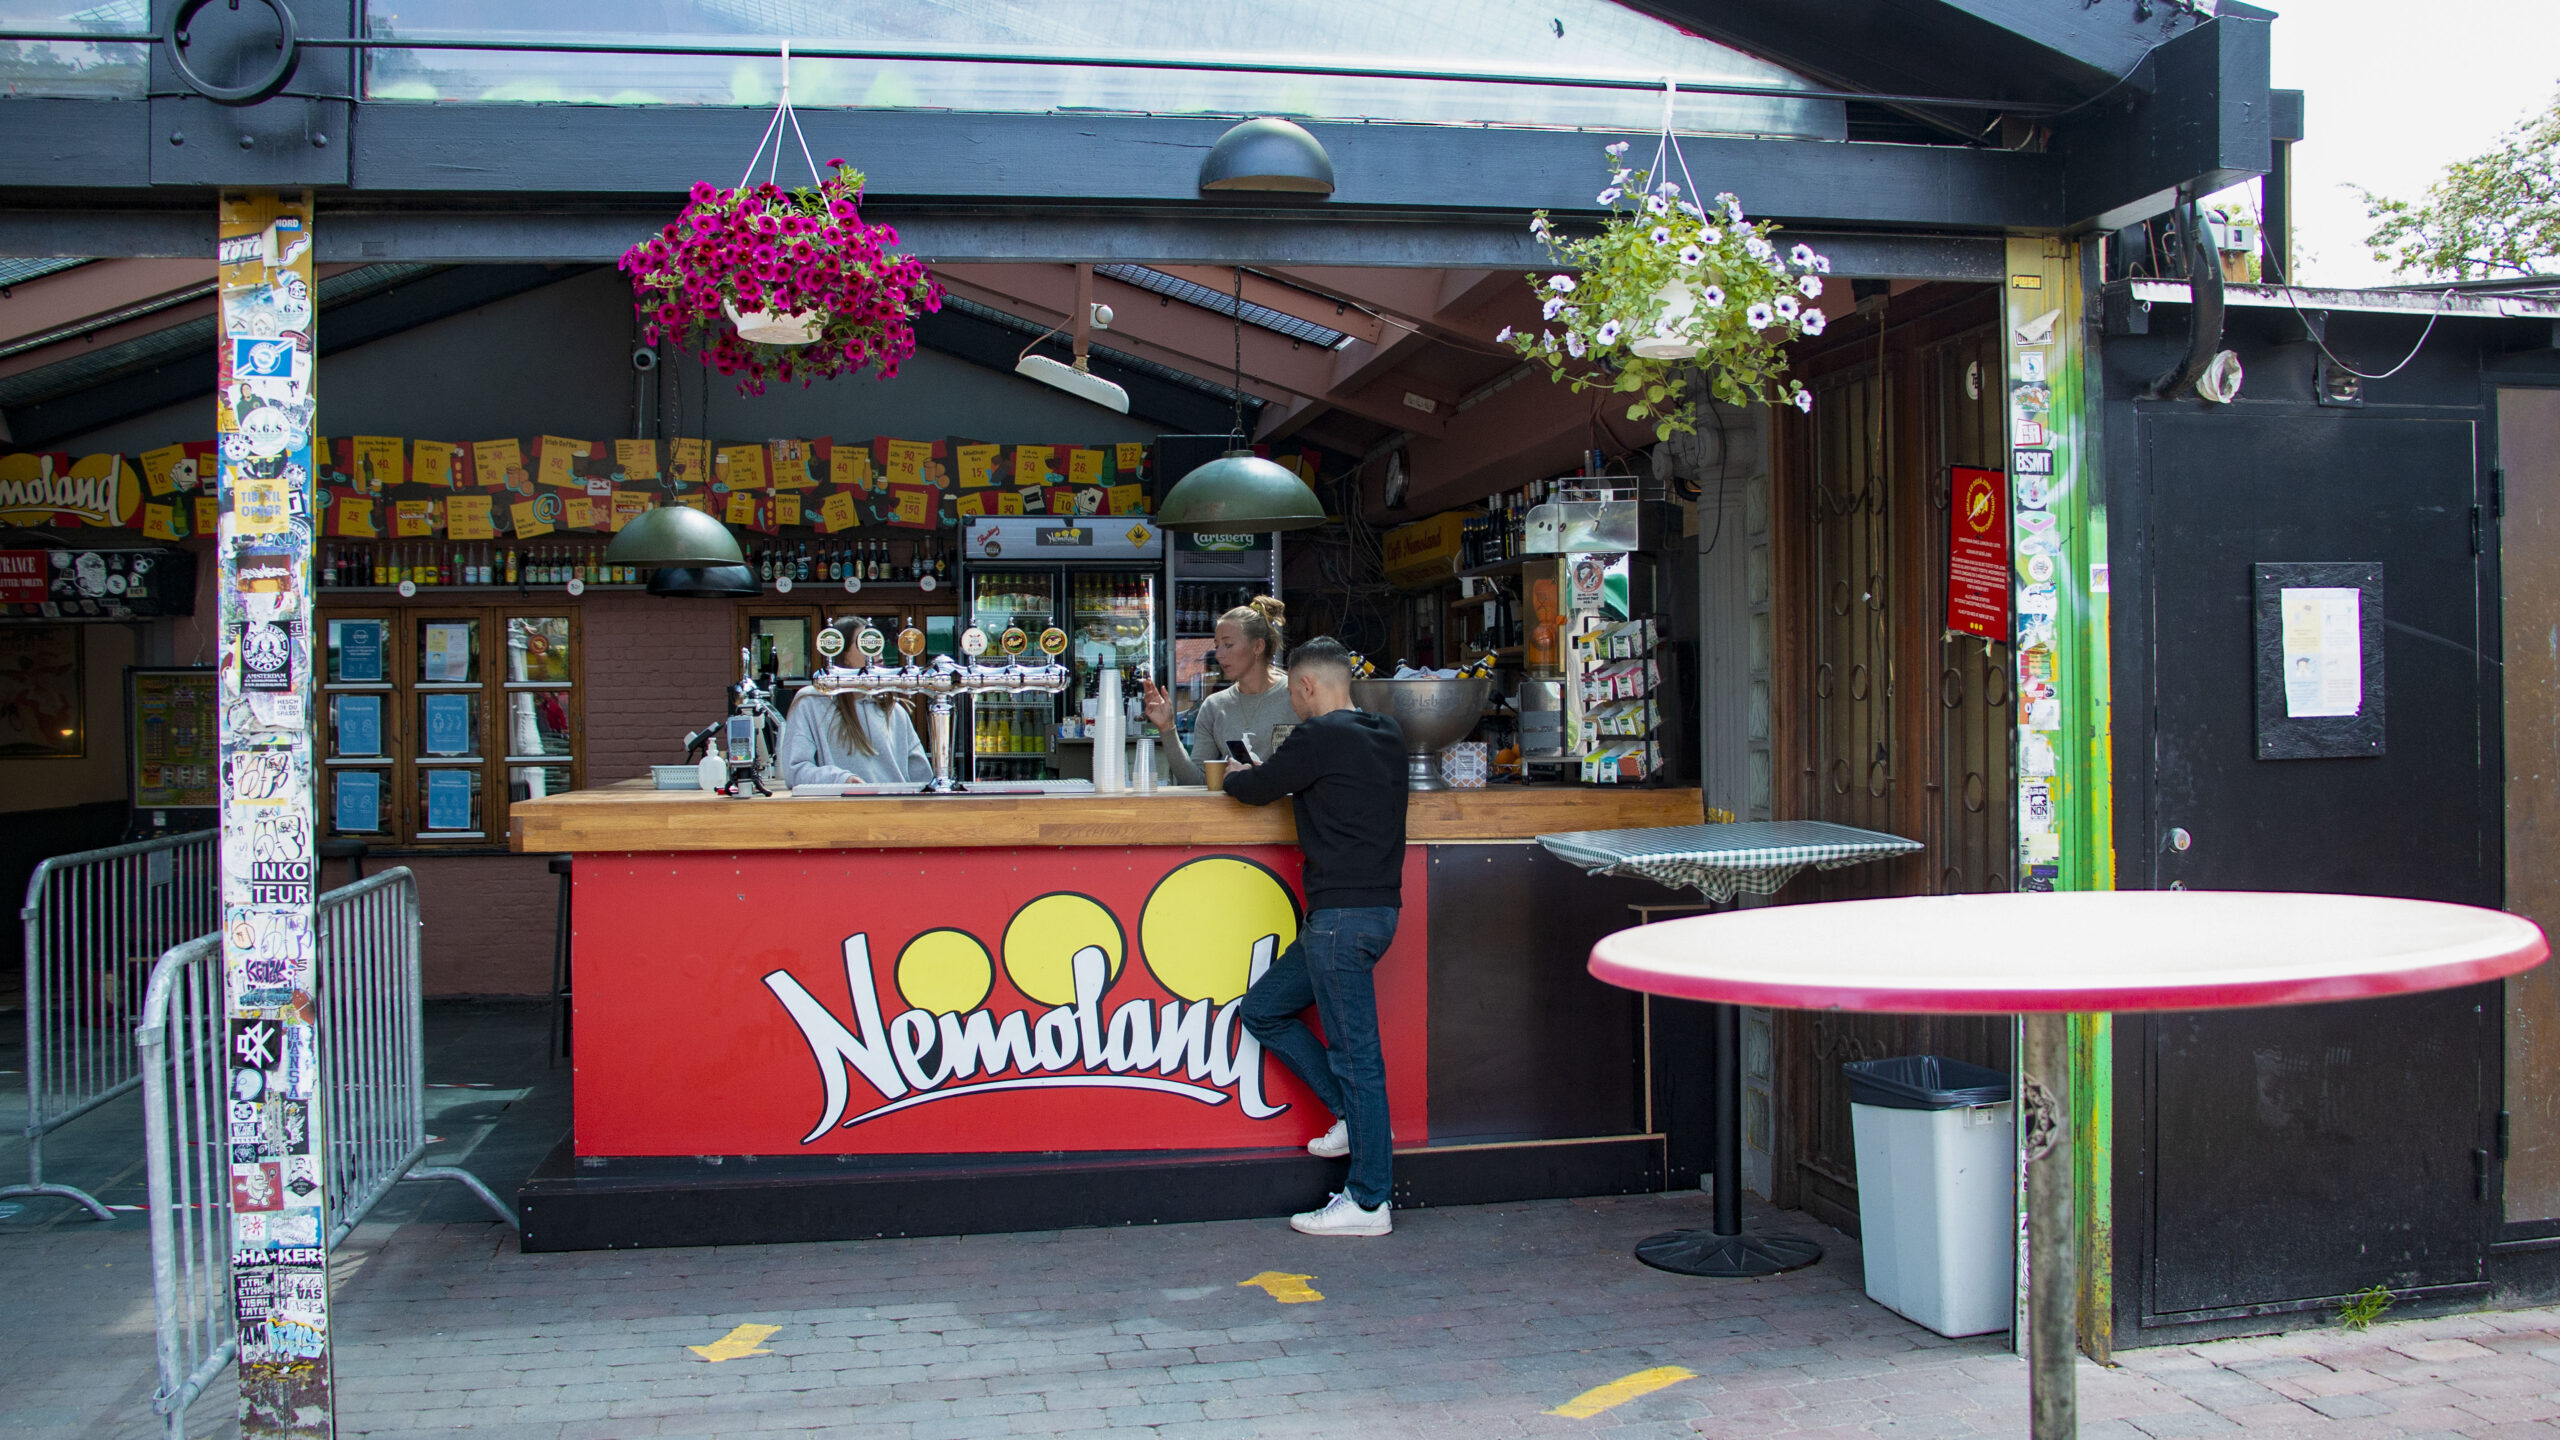 Café Nemoland Brunch Christianshavn Mad Bistro Café Nemo Søndagskoncerter Backgammon spil Pusherstreet Christiania